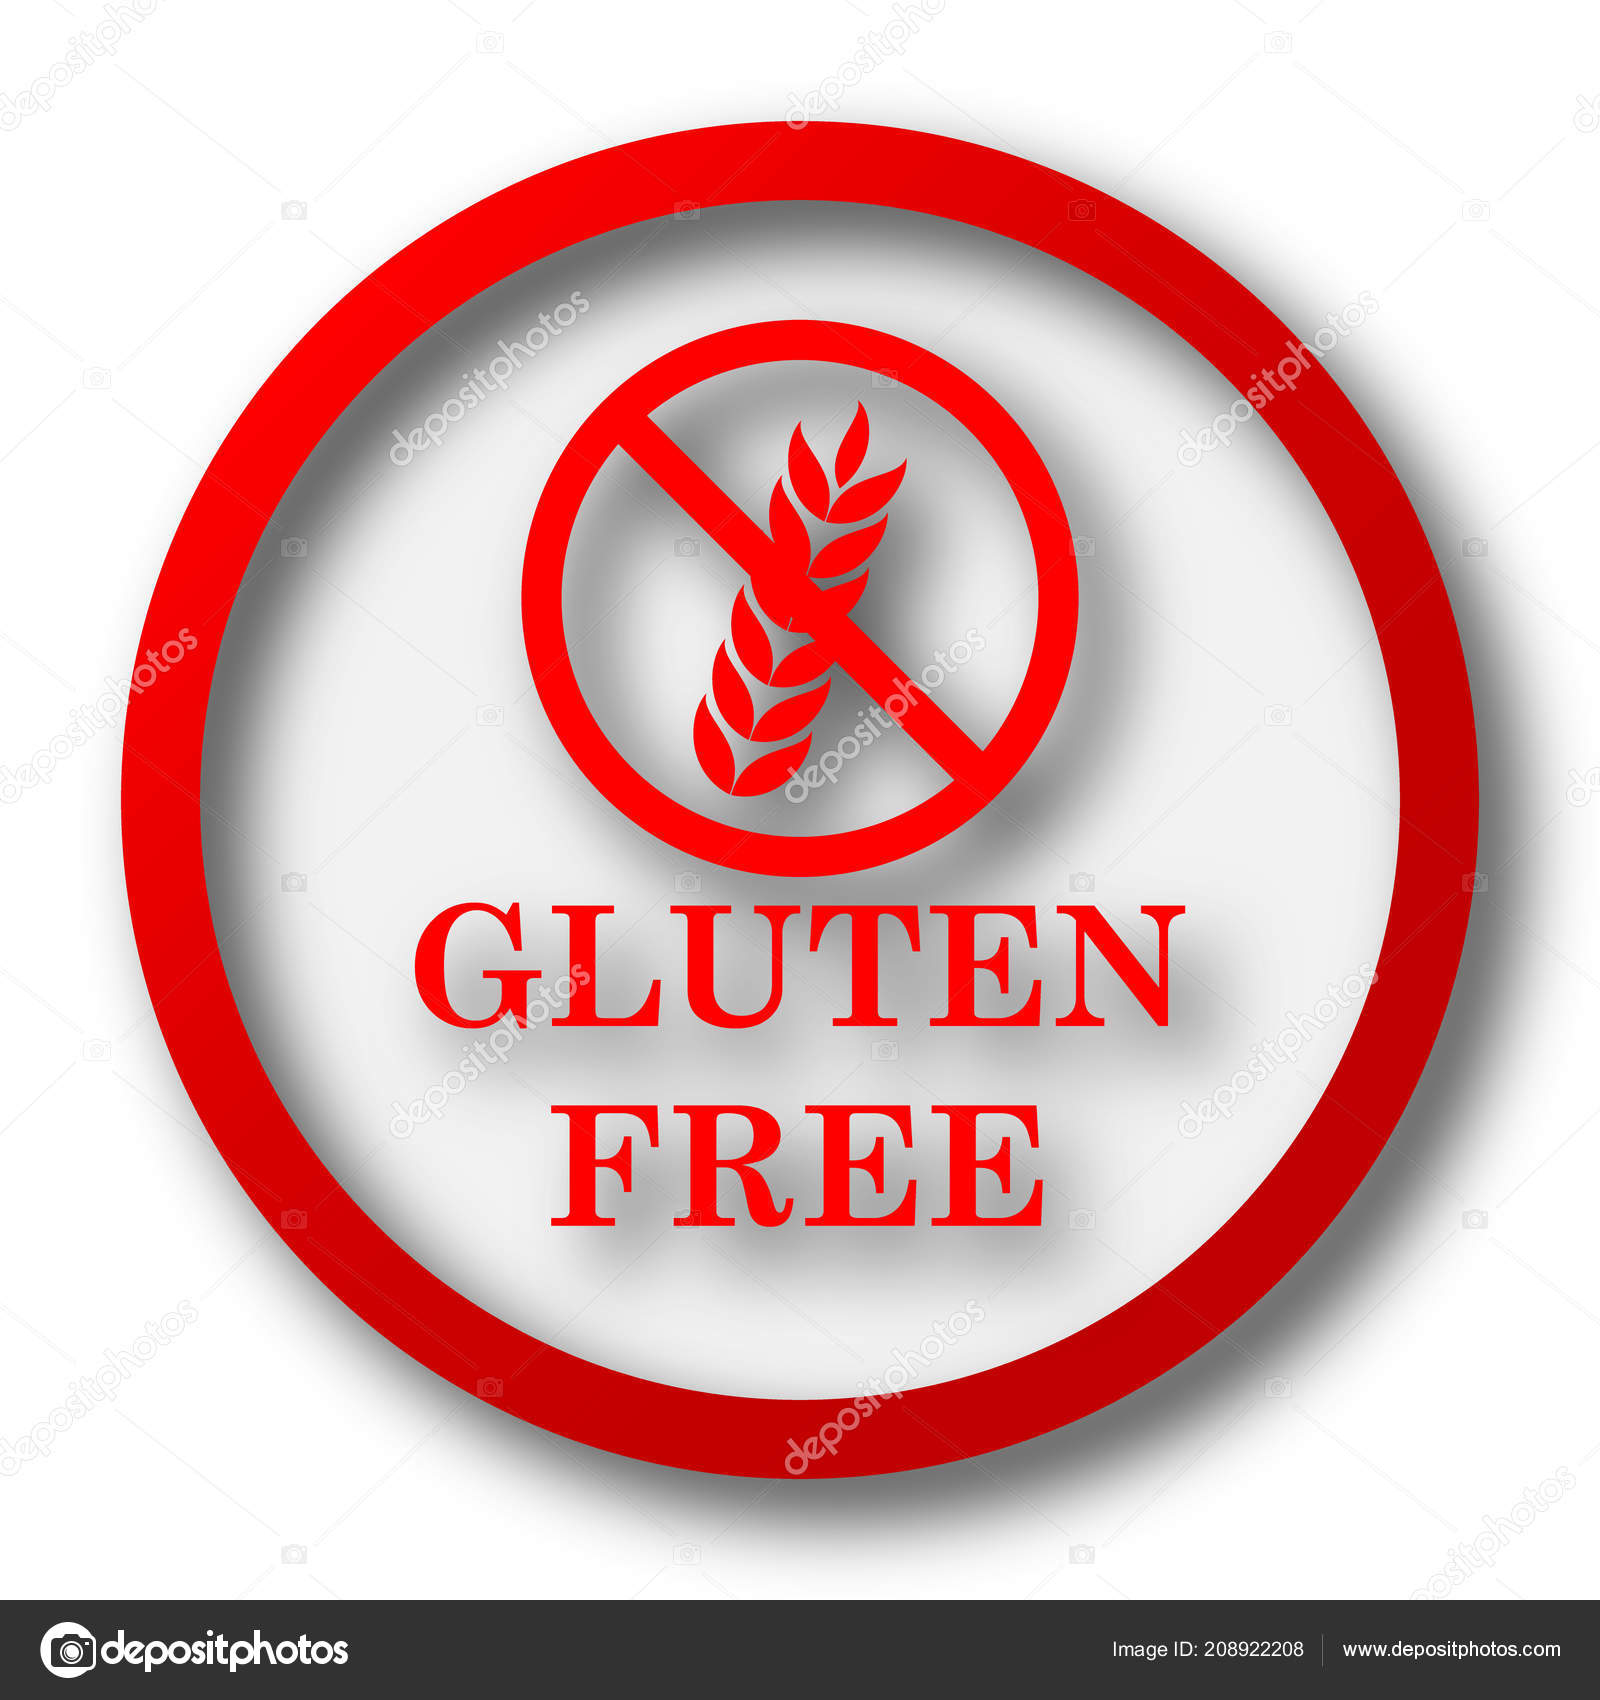 Gluten free icon — Stock Photo © valentint #208922208